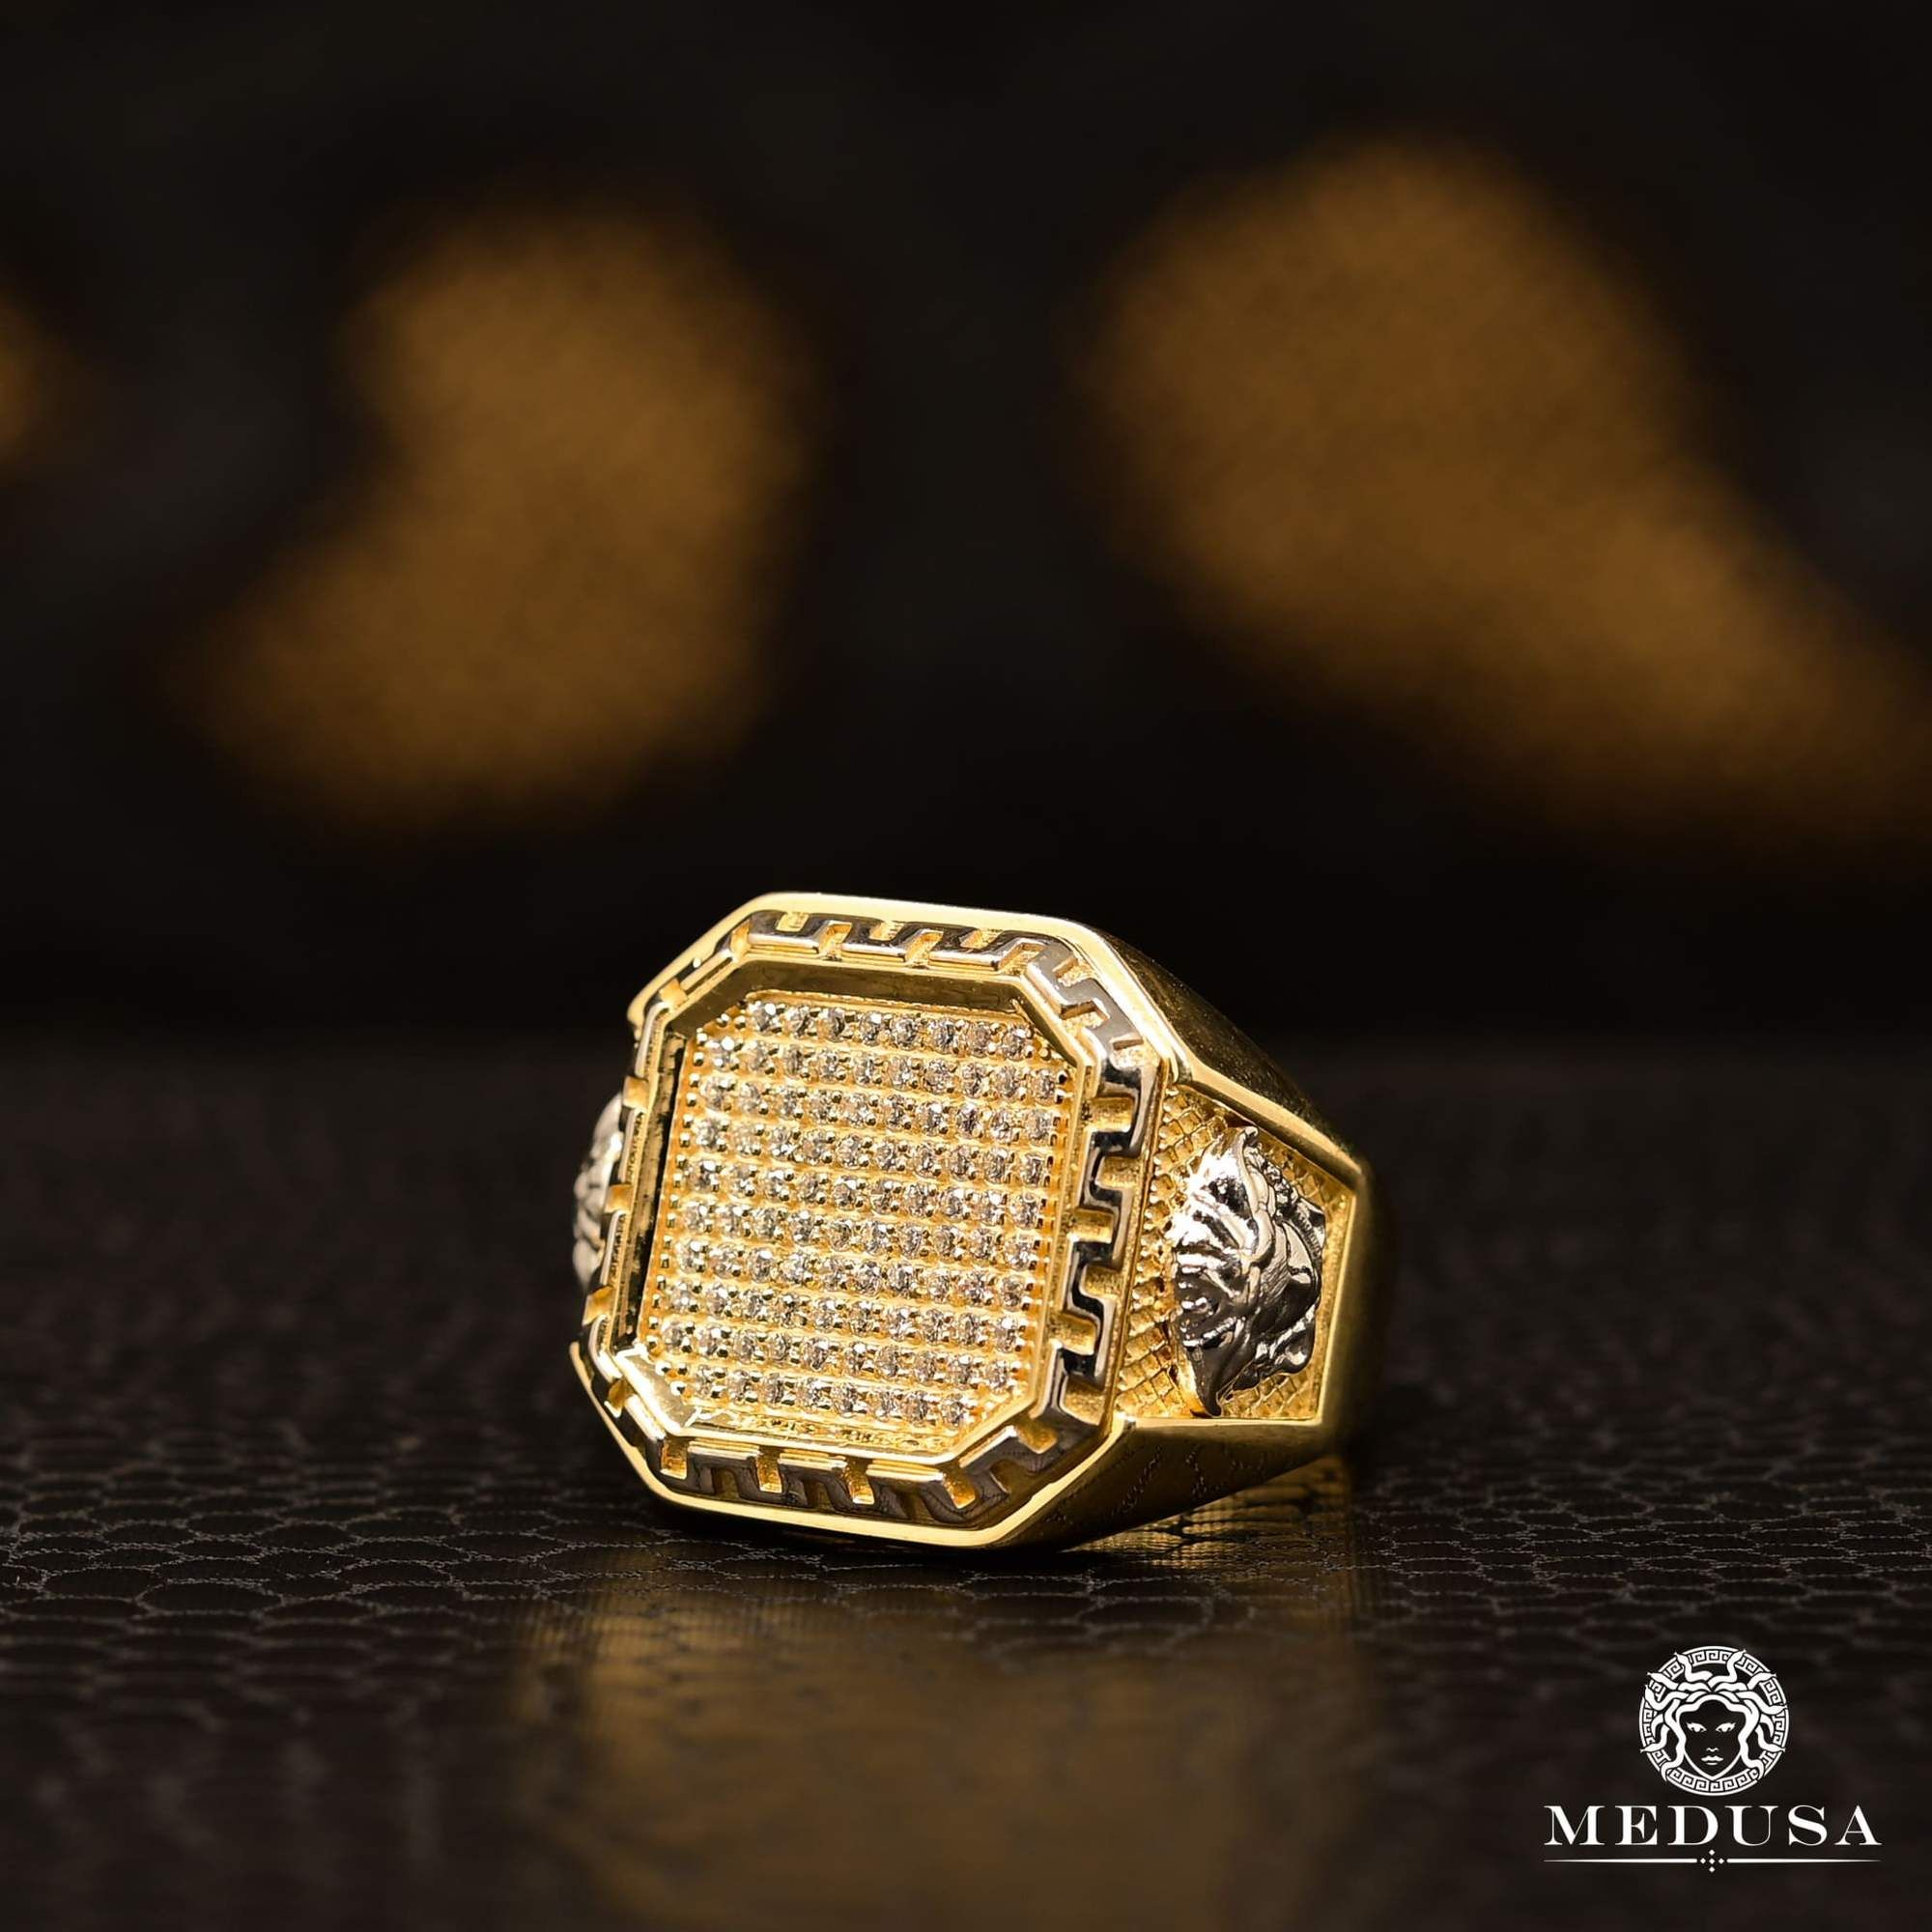 Square H24 in 2020 Rings for men, Mens ring designs